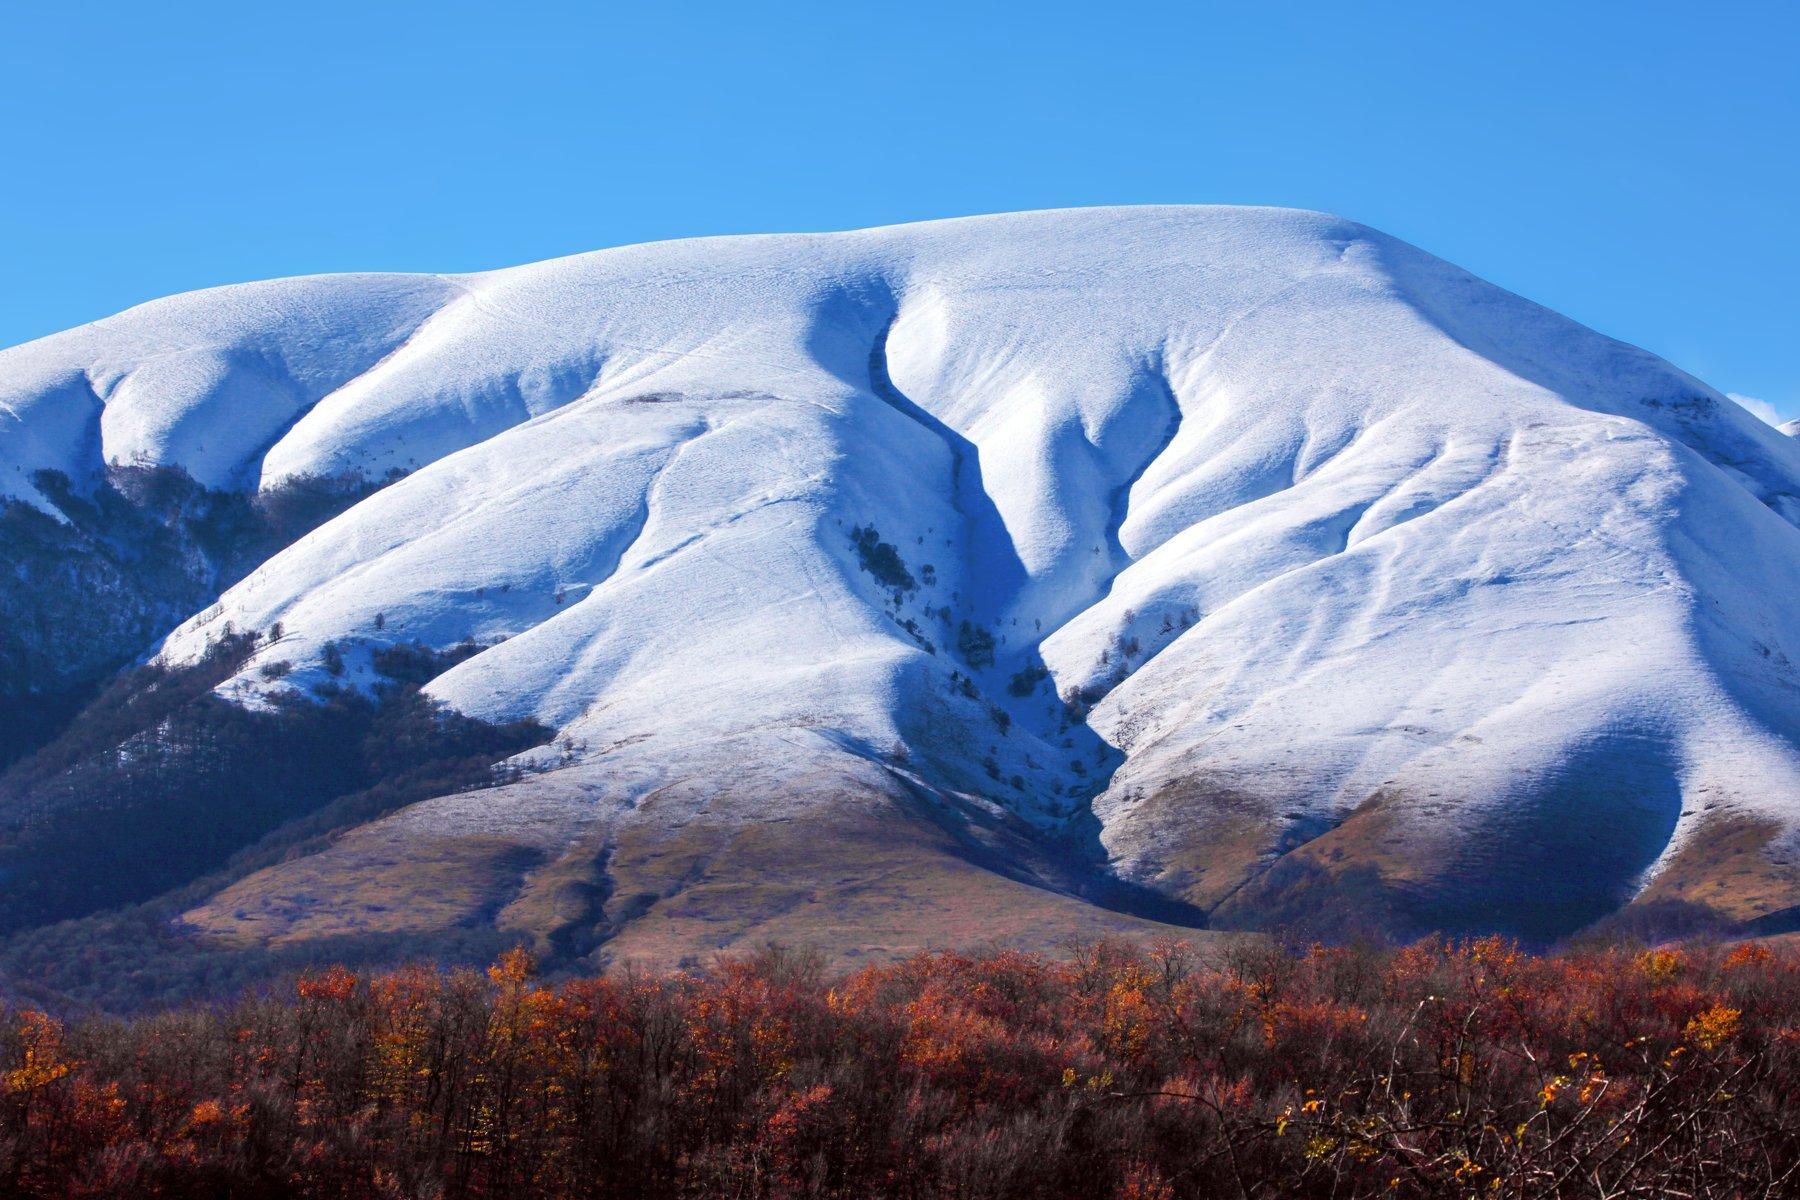 горы,осень,природа,снег,дагестан., Марат Магов